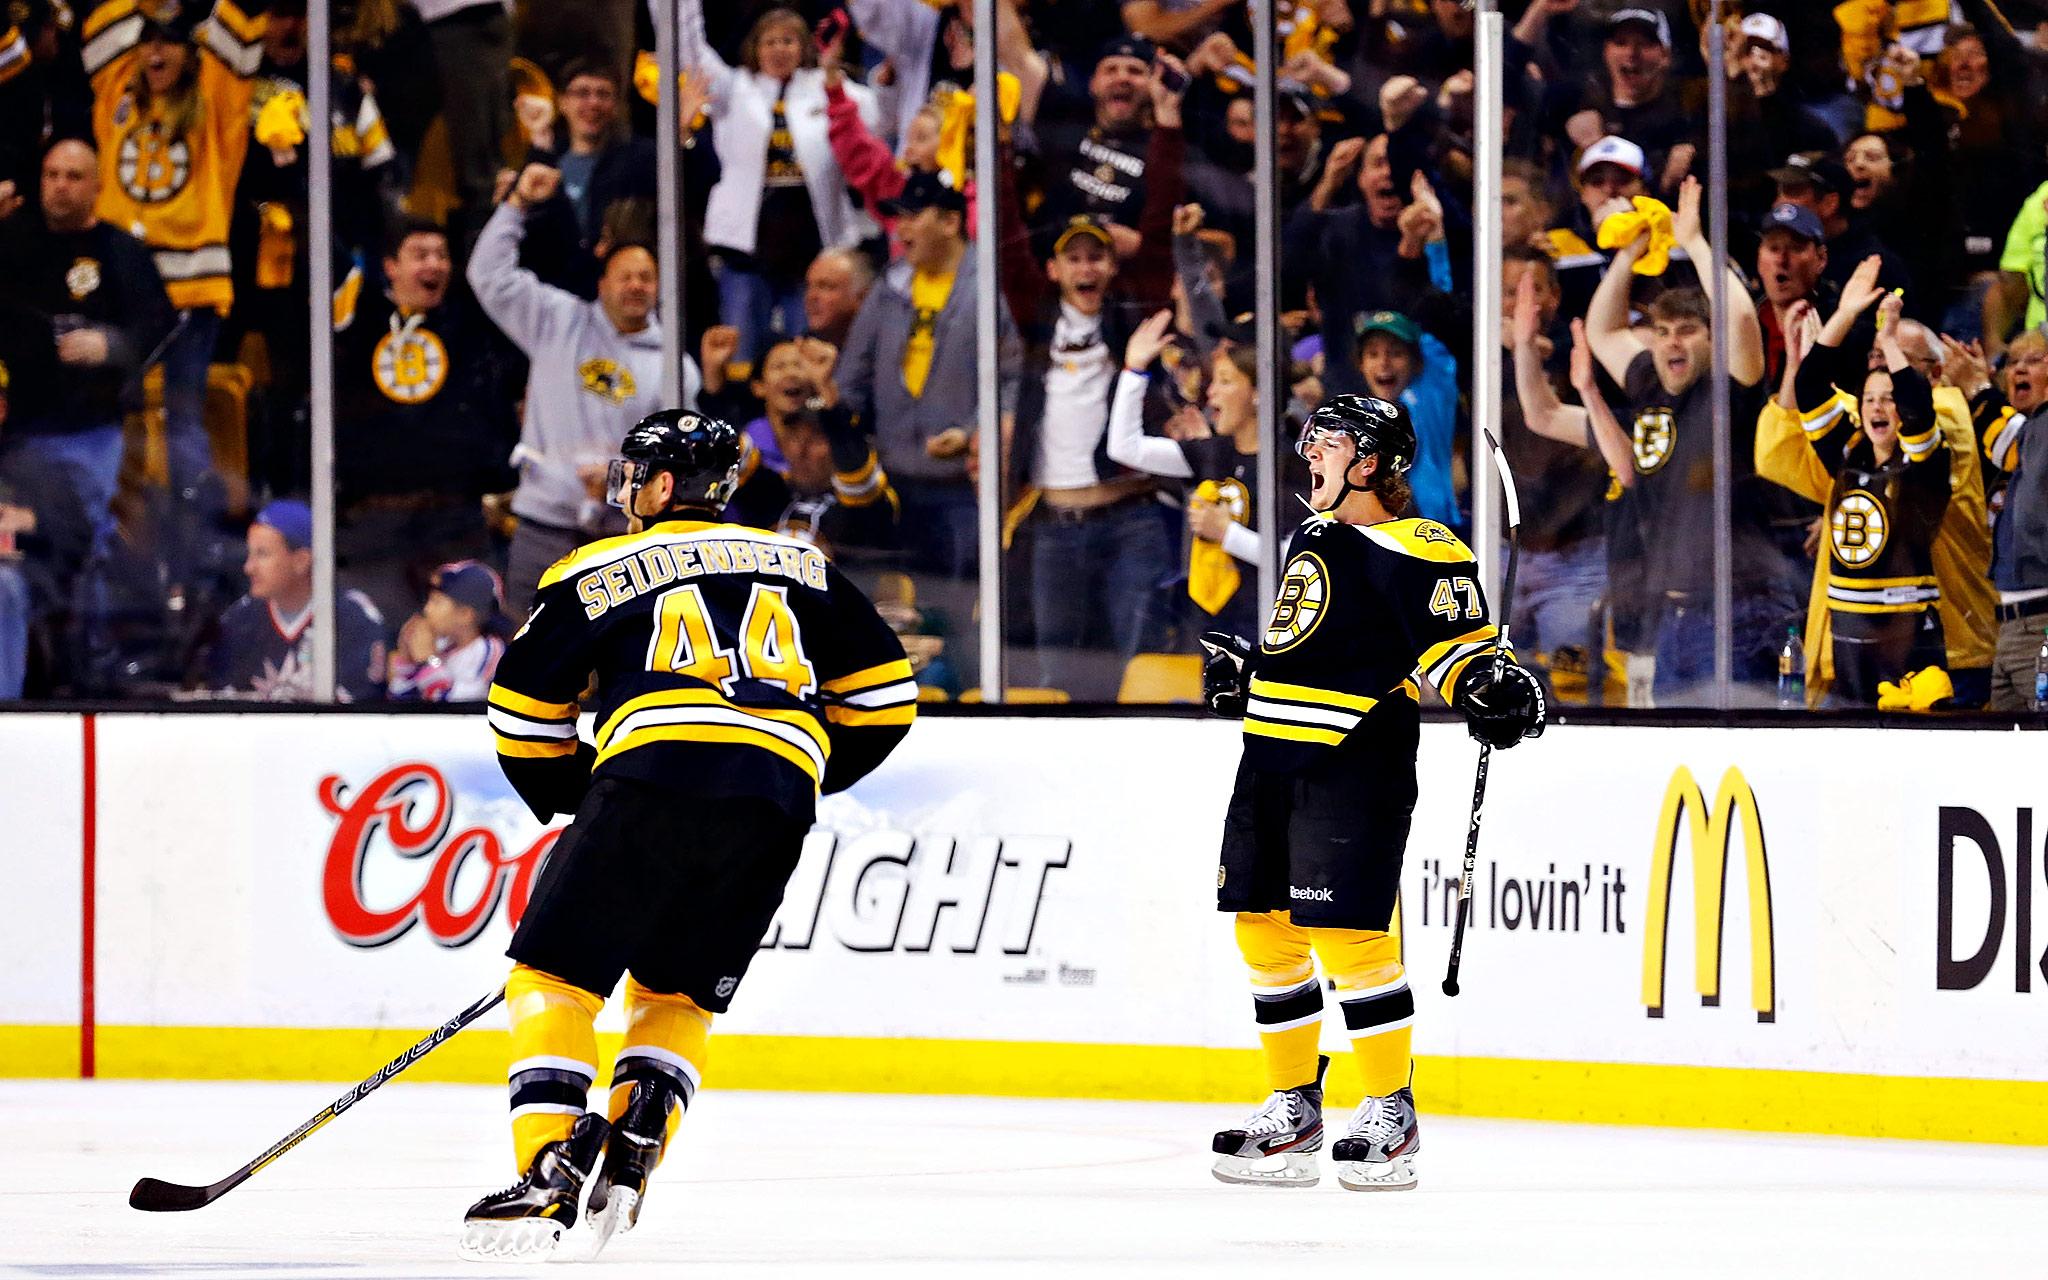 Bravo, Bruins